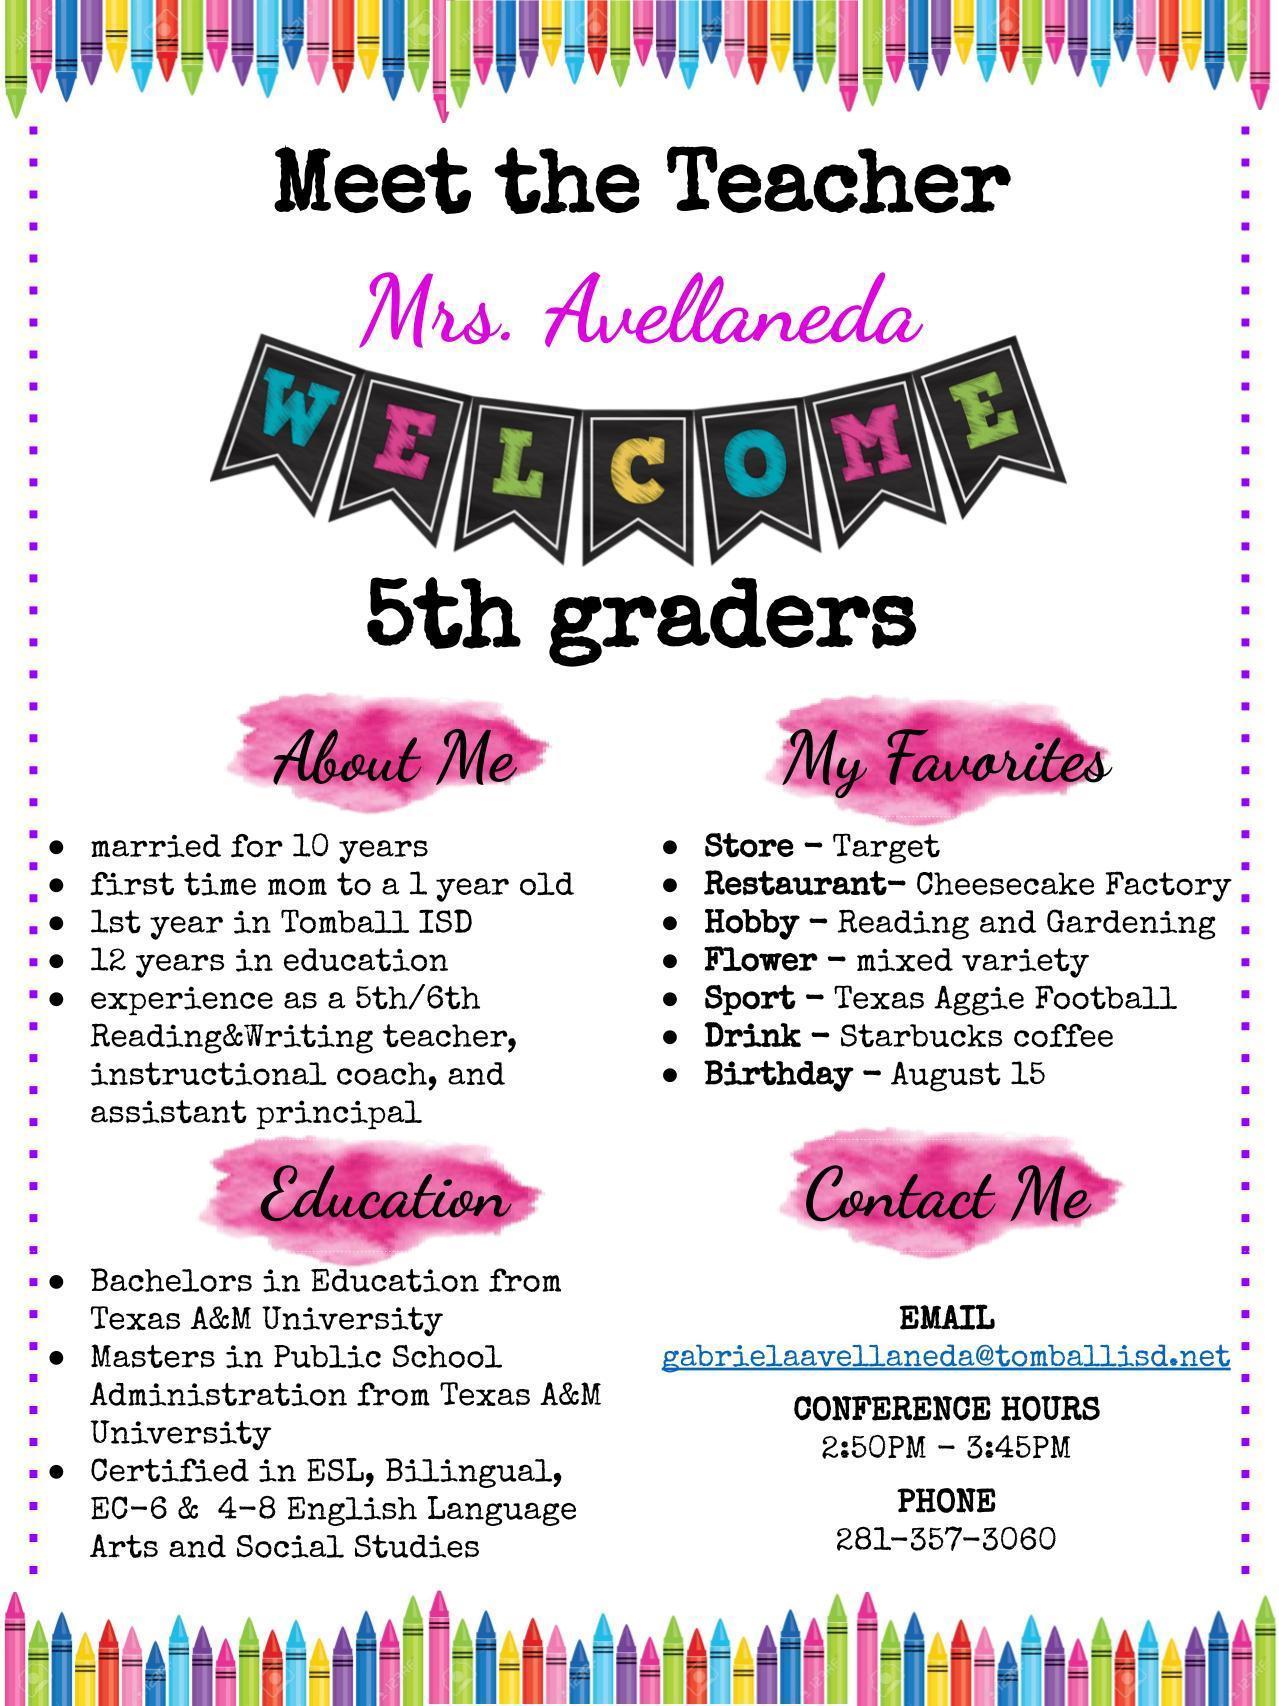 Mrs. Avellaneda (Ah-ve-YA-neh-Da)